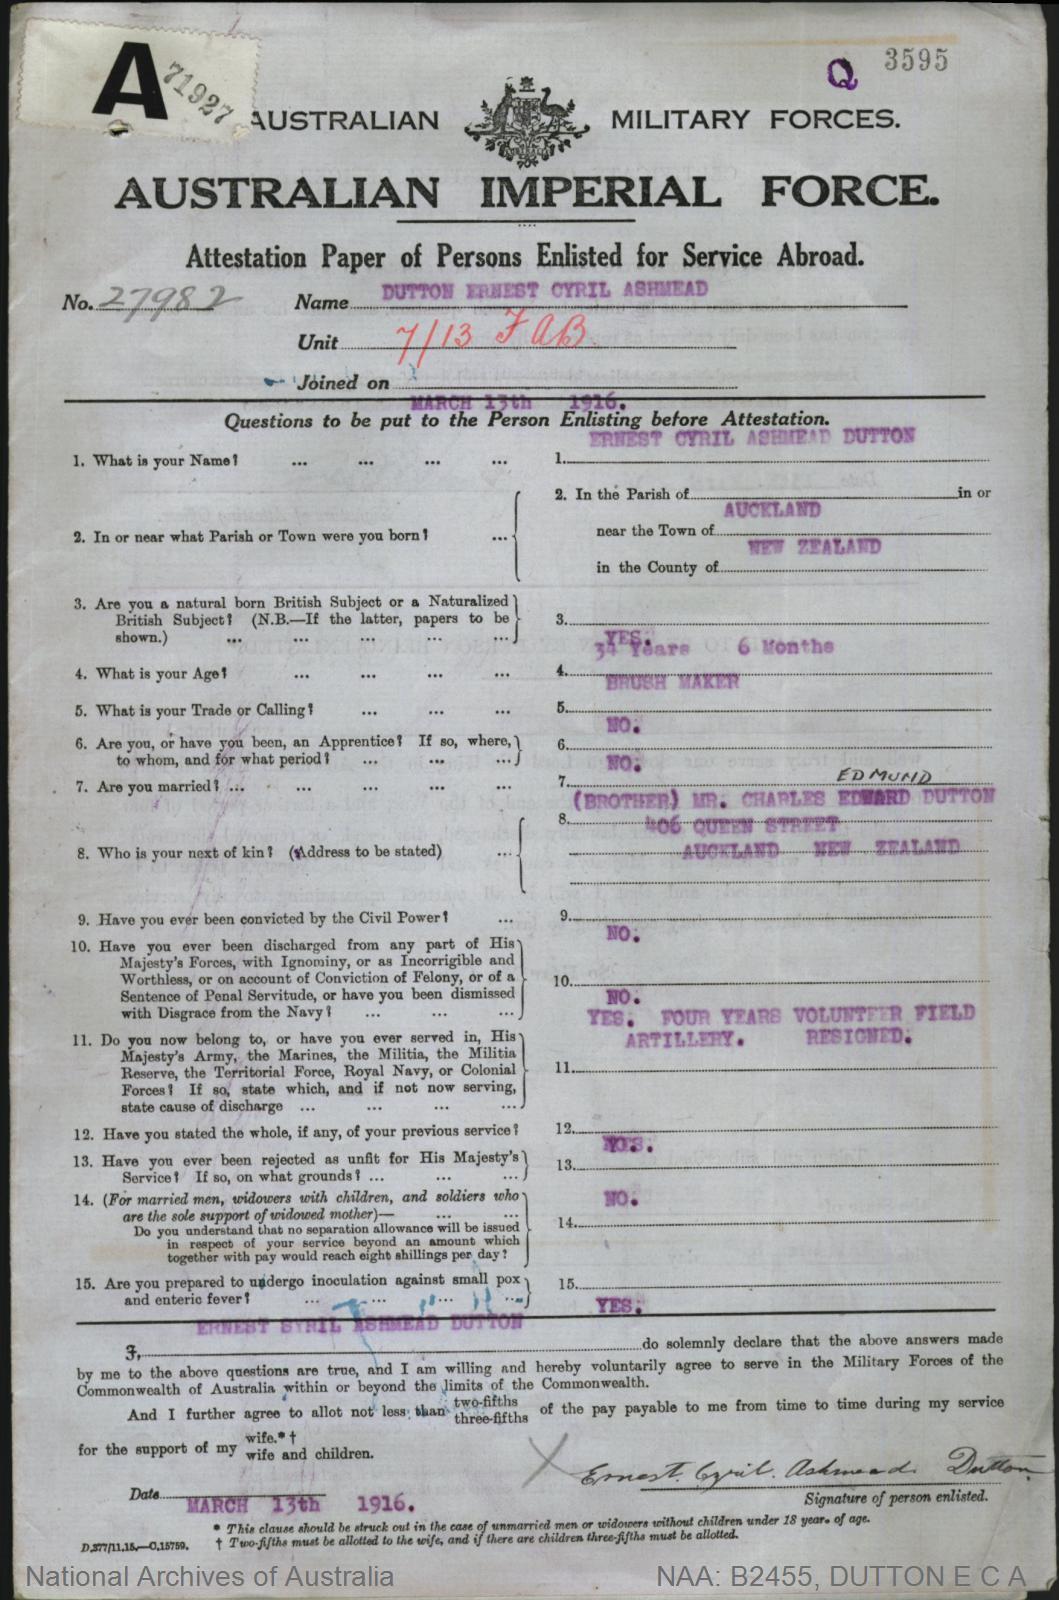 Dutton Ernest Cyril Ashmead : SERN 27982 : POB Auckland New Zealand : POE Brisbane QLD : NOK B Dutton Charles Edmund